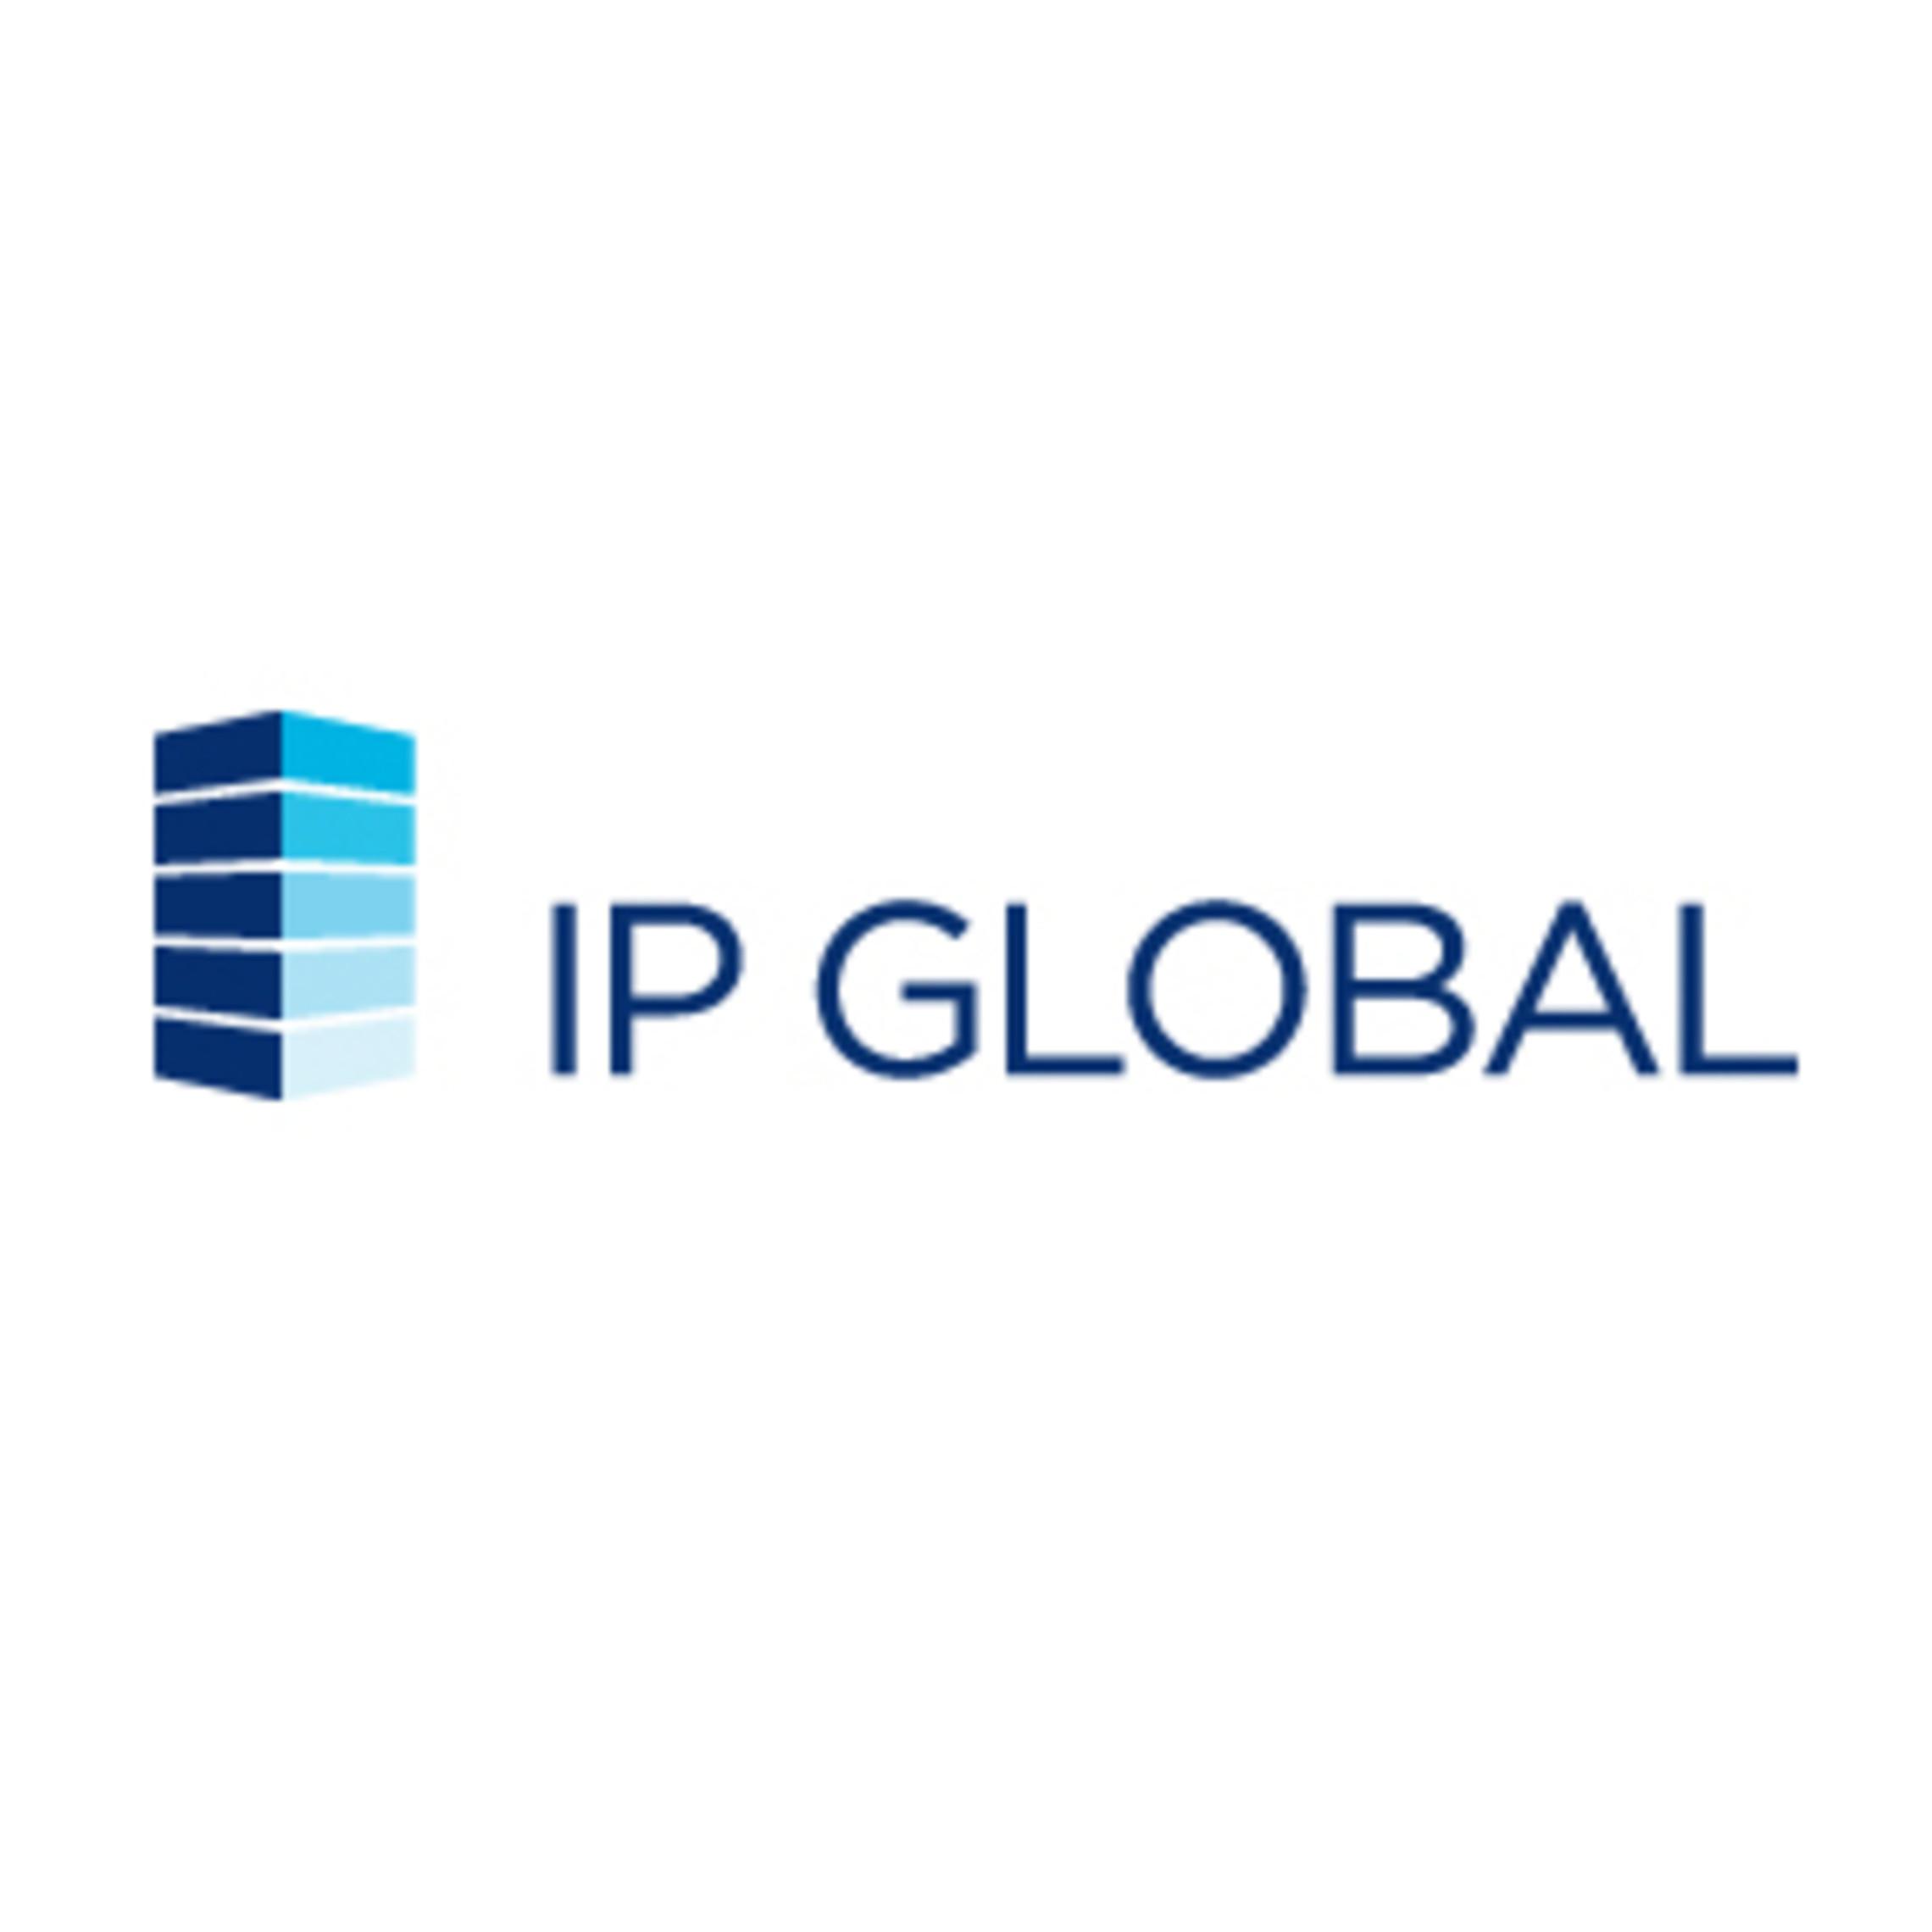 ip global- company logo